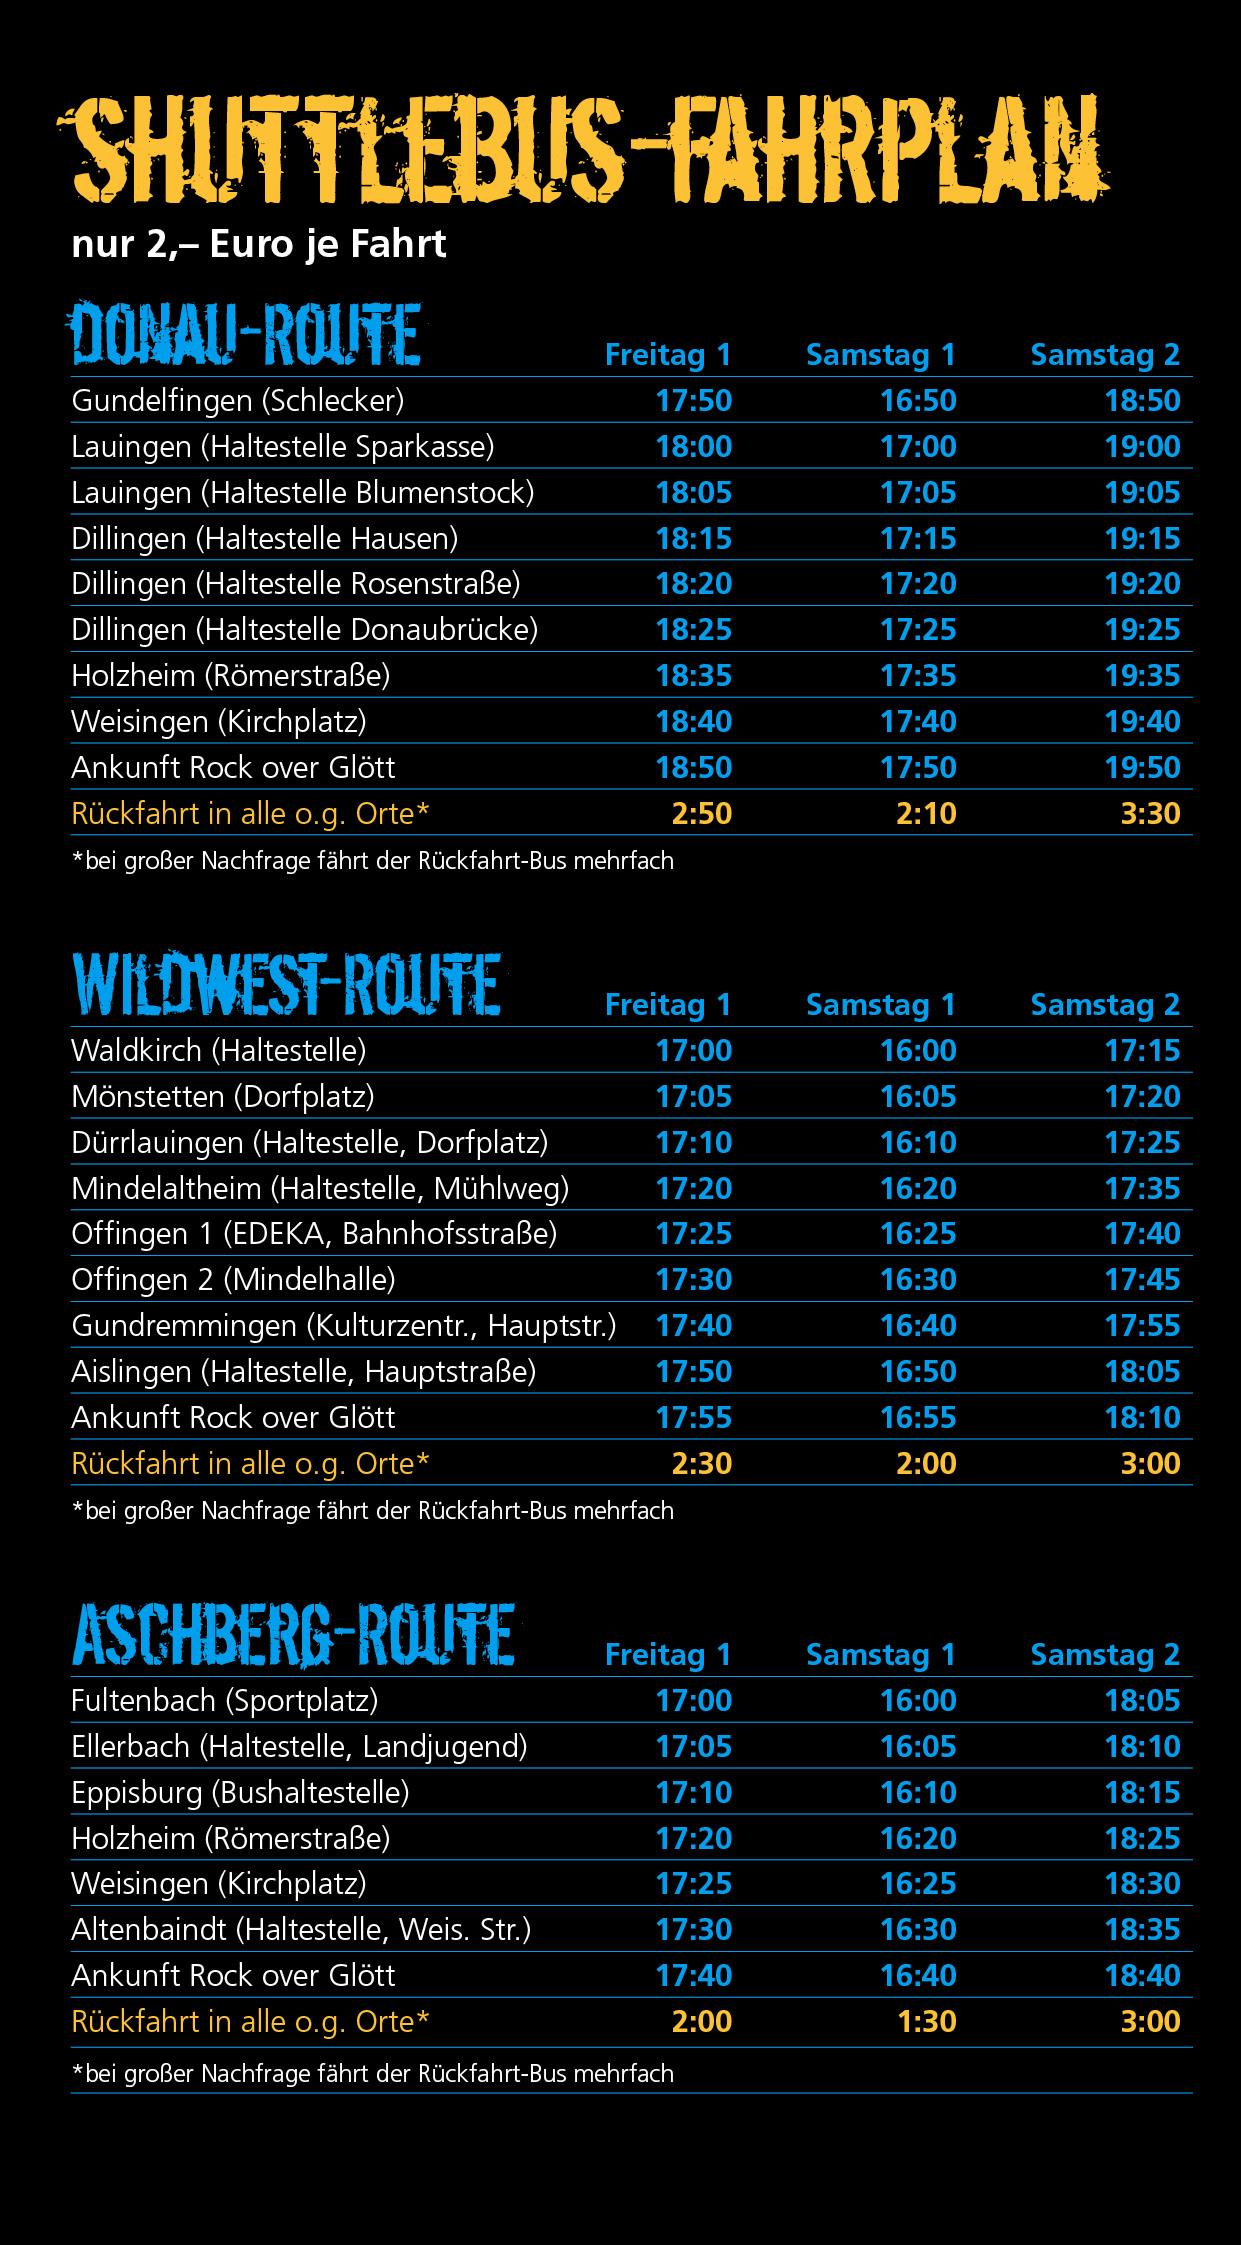 Shuttlebus_Fahrplan_ROG2014_OpenAir